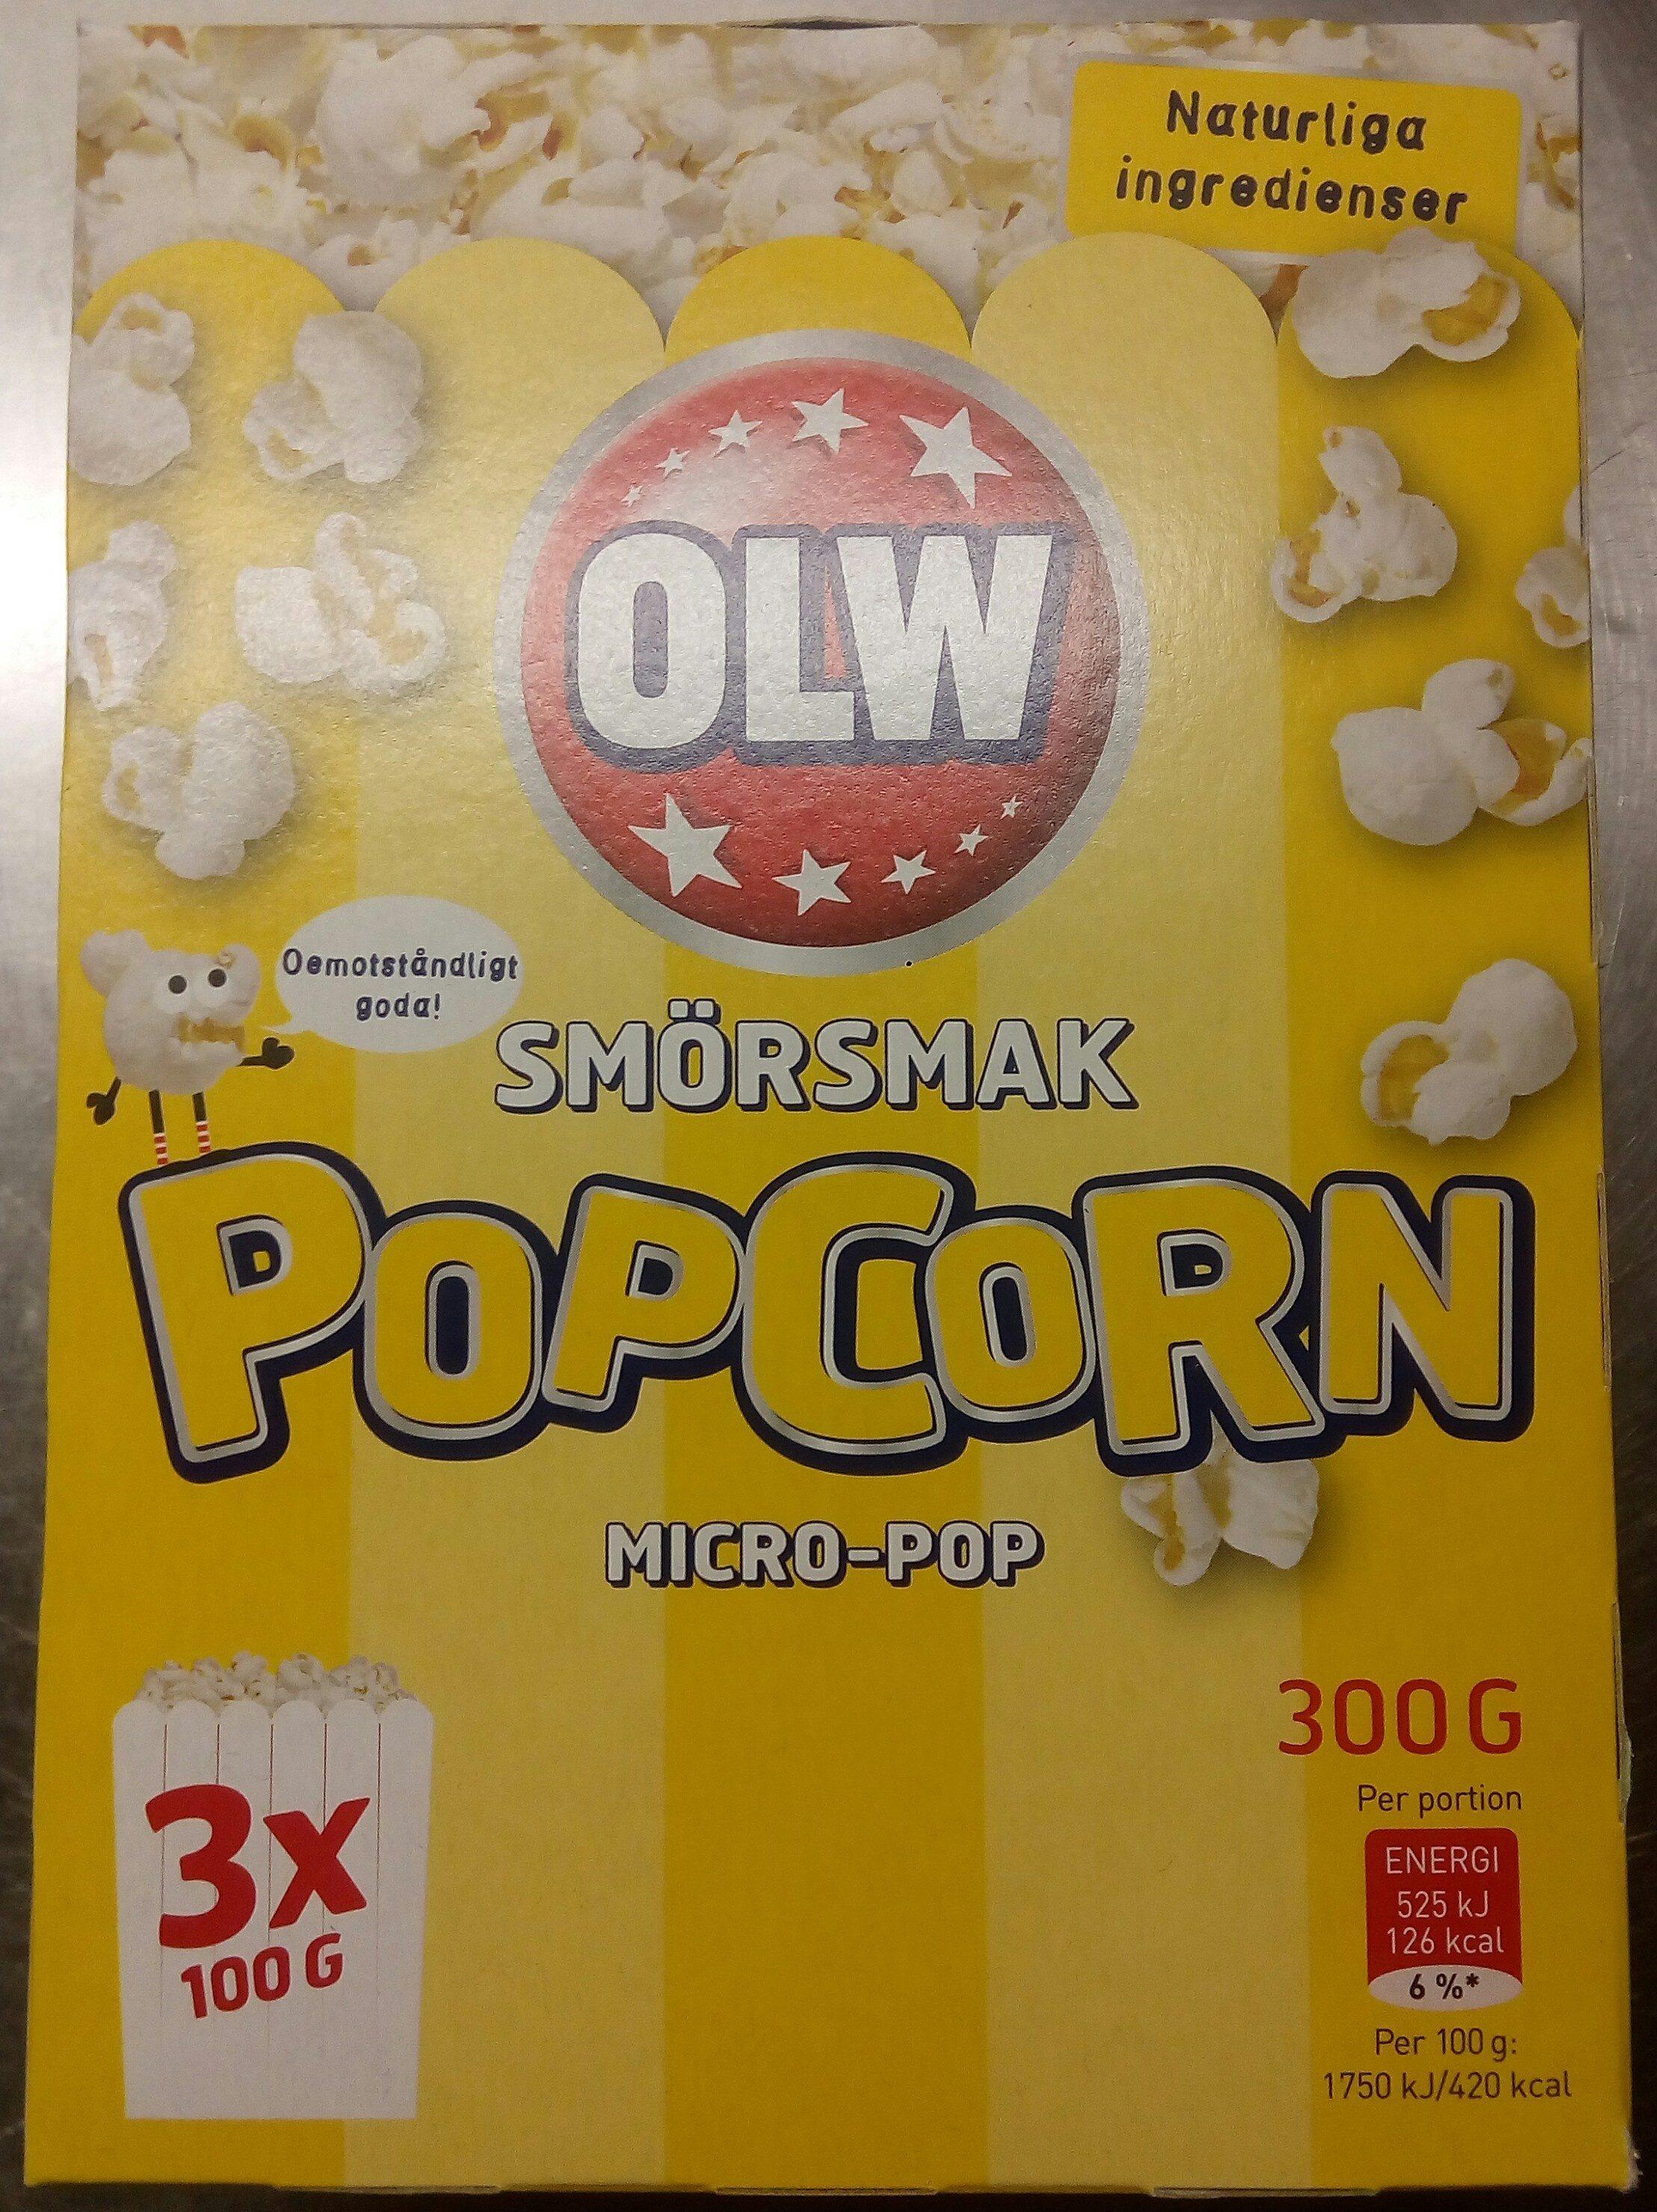 OLW Popcorn Smörsmak - Prodotto - sv